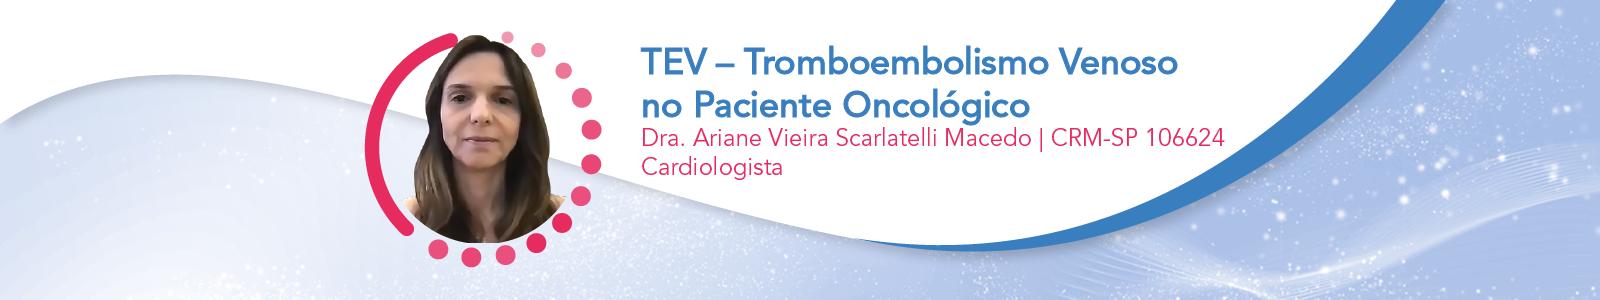 TVP-Banners-aulas-rosa-TEV oncológico